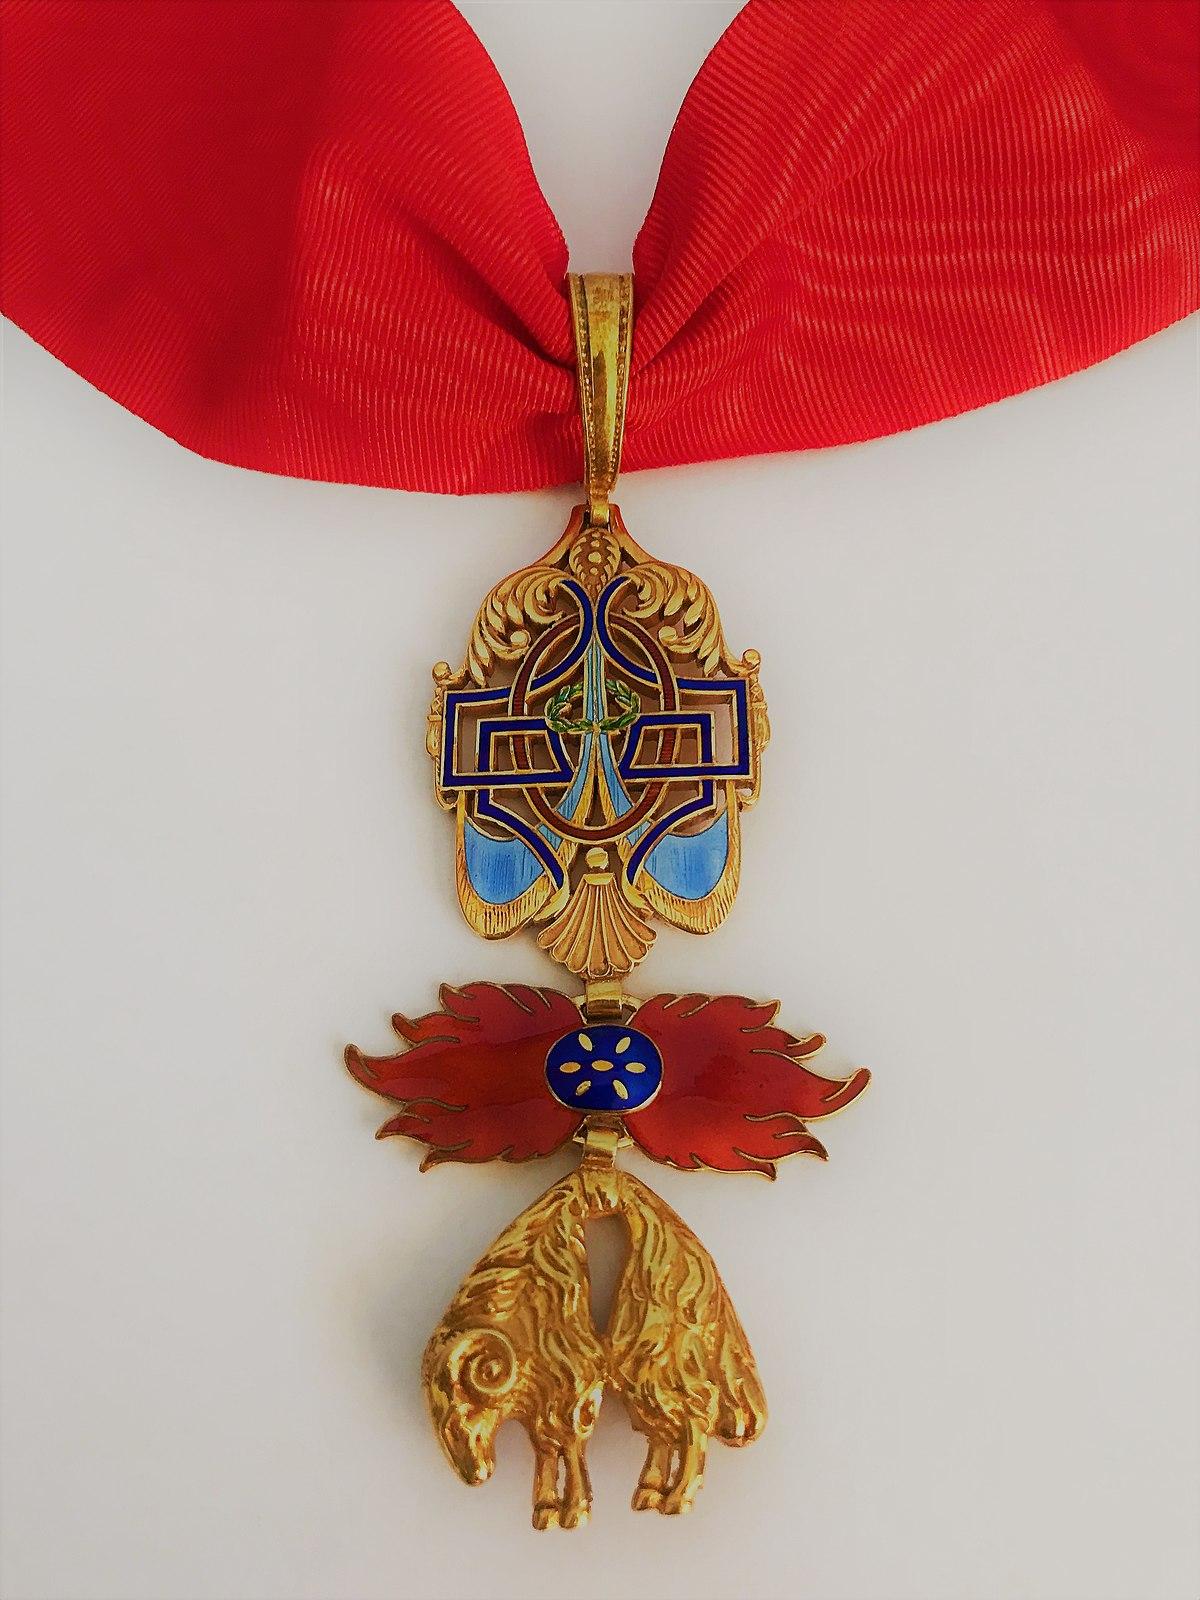 Order of the Golden Fleece - Wikipedia